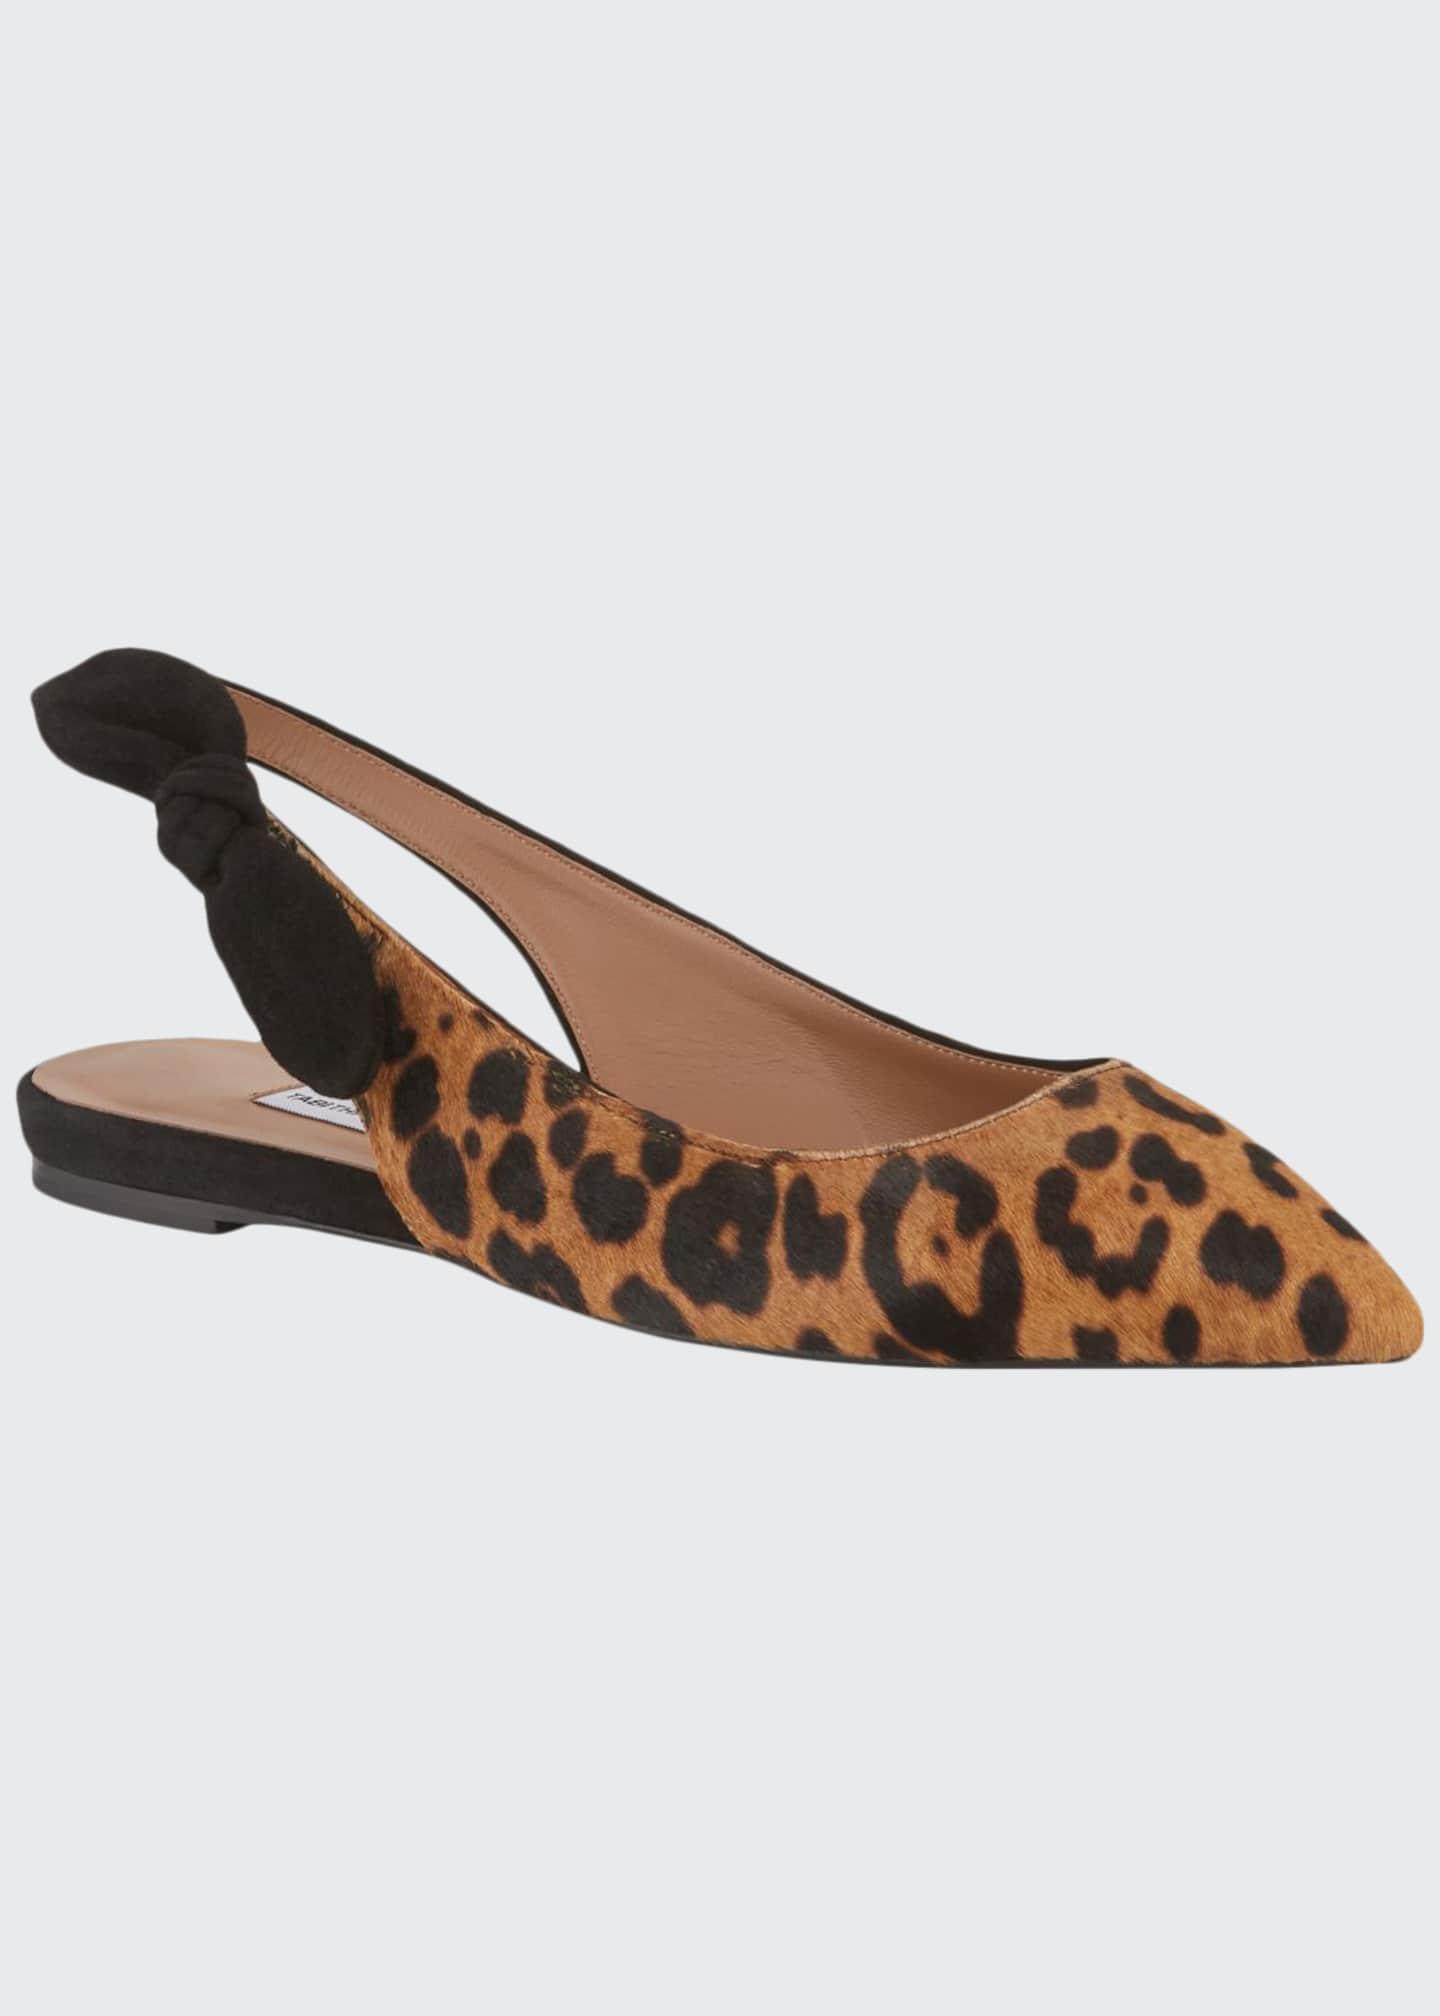 Tabitha Simmons Leopard-Print Calf Hair Slingback Flats